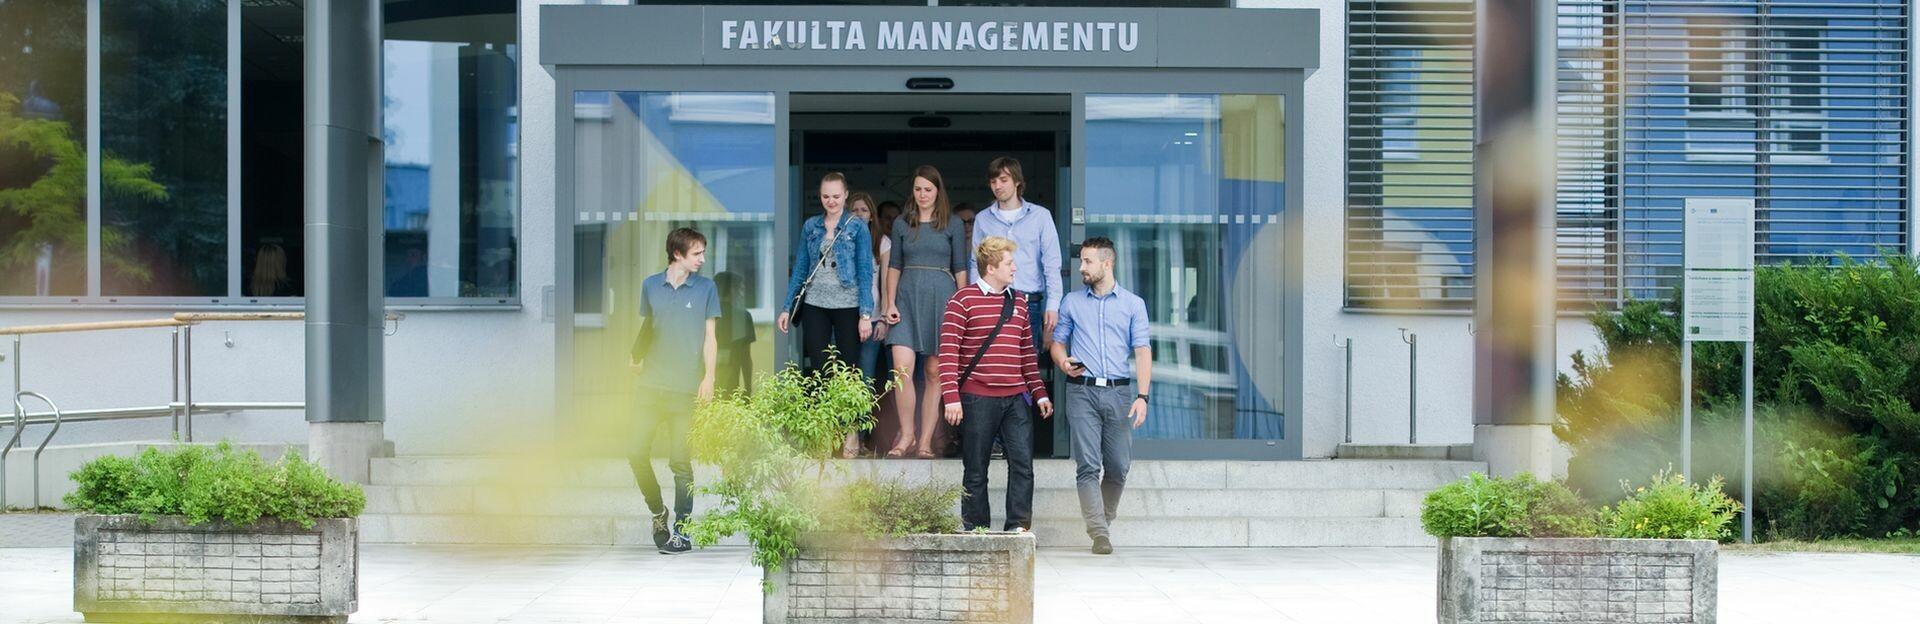 Fakulta managementu (FMVŠE)